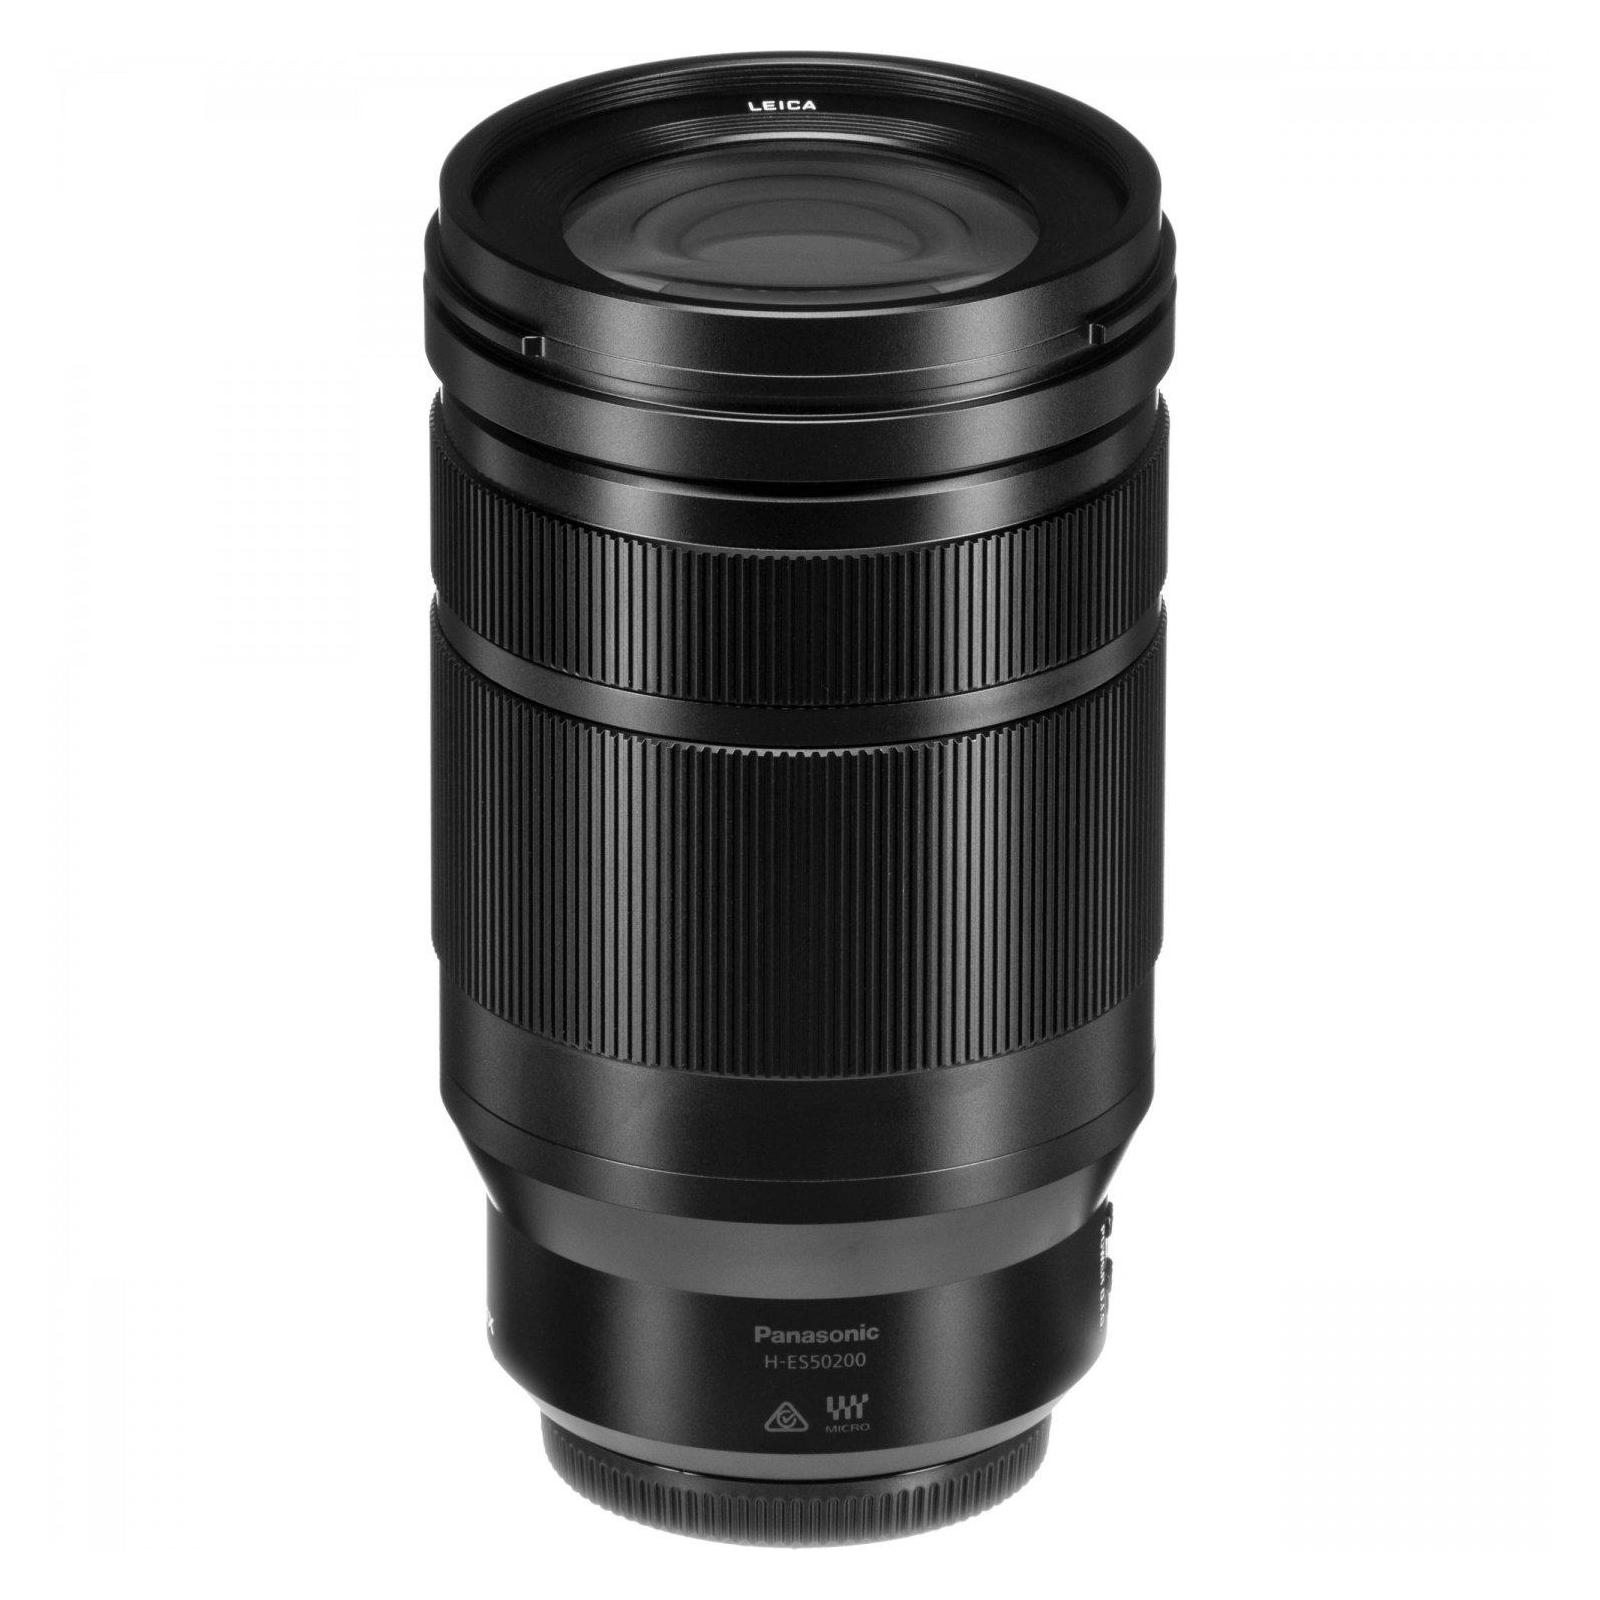 Объектив PANASONIC Micro 4/3 Lens 50-200 mm f/2.8-4 ASPH. POWER O.I.S. Leica DG (H-ES50200E) изображение 7